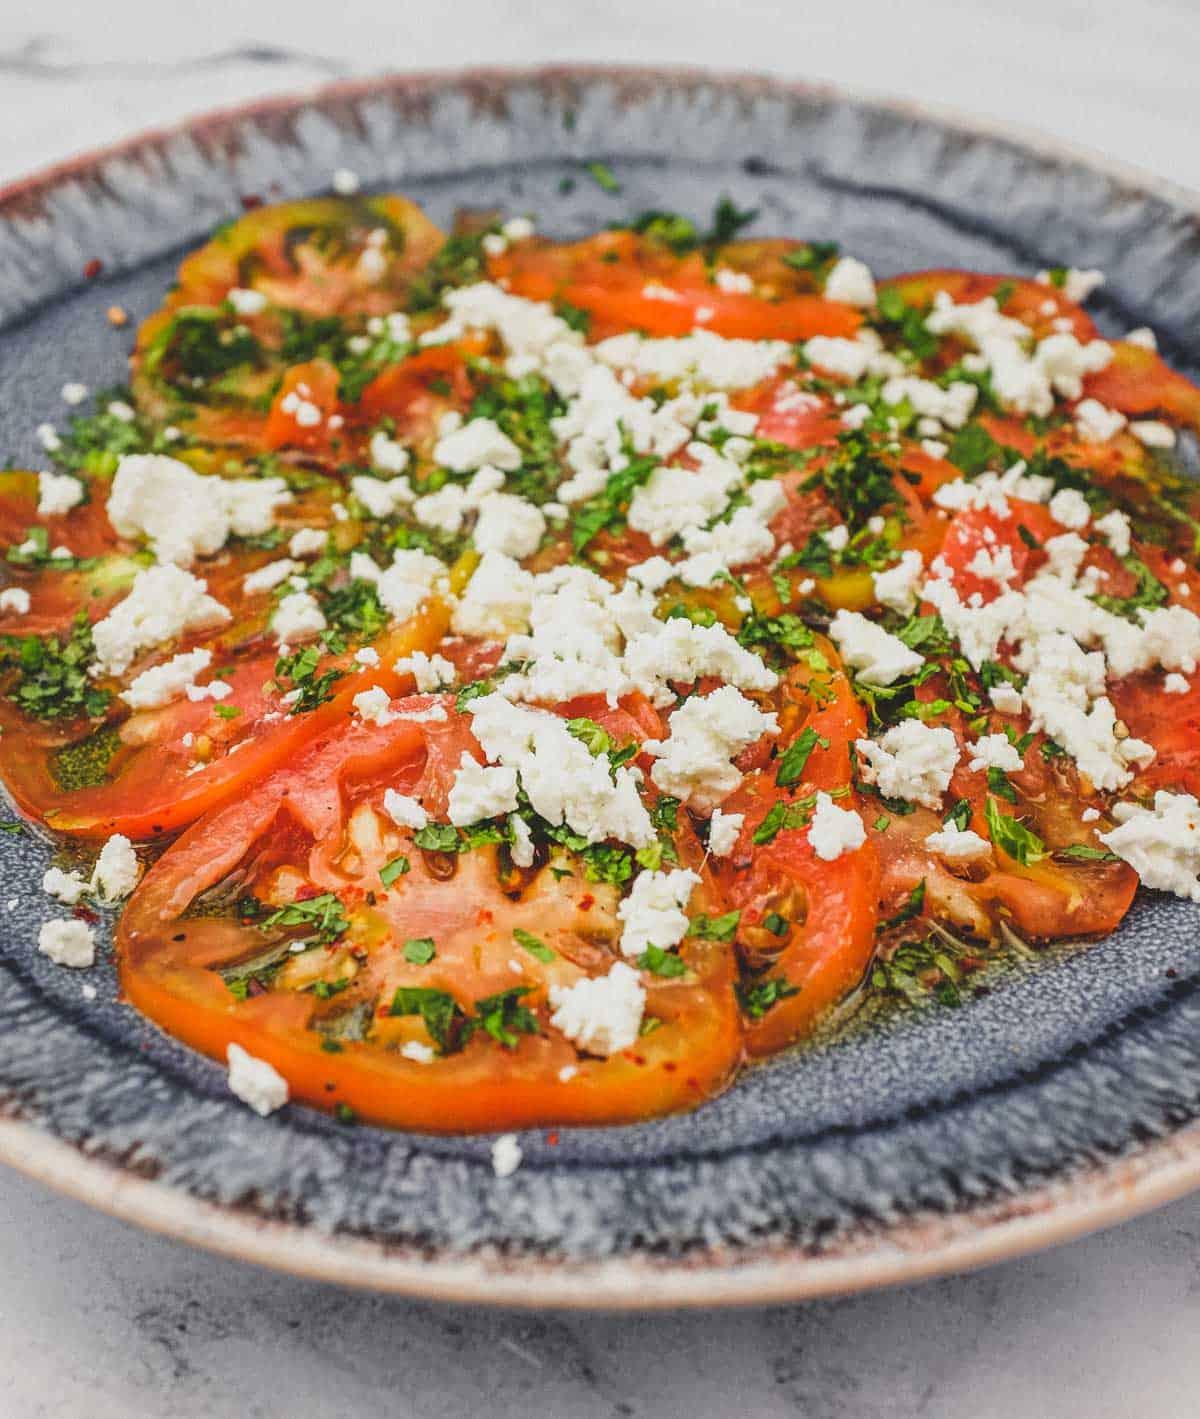 Tomato & Feta Salad